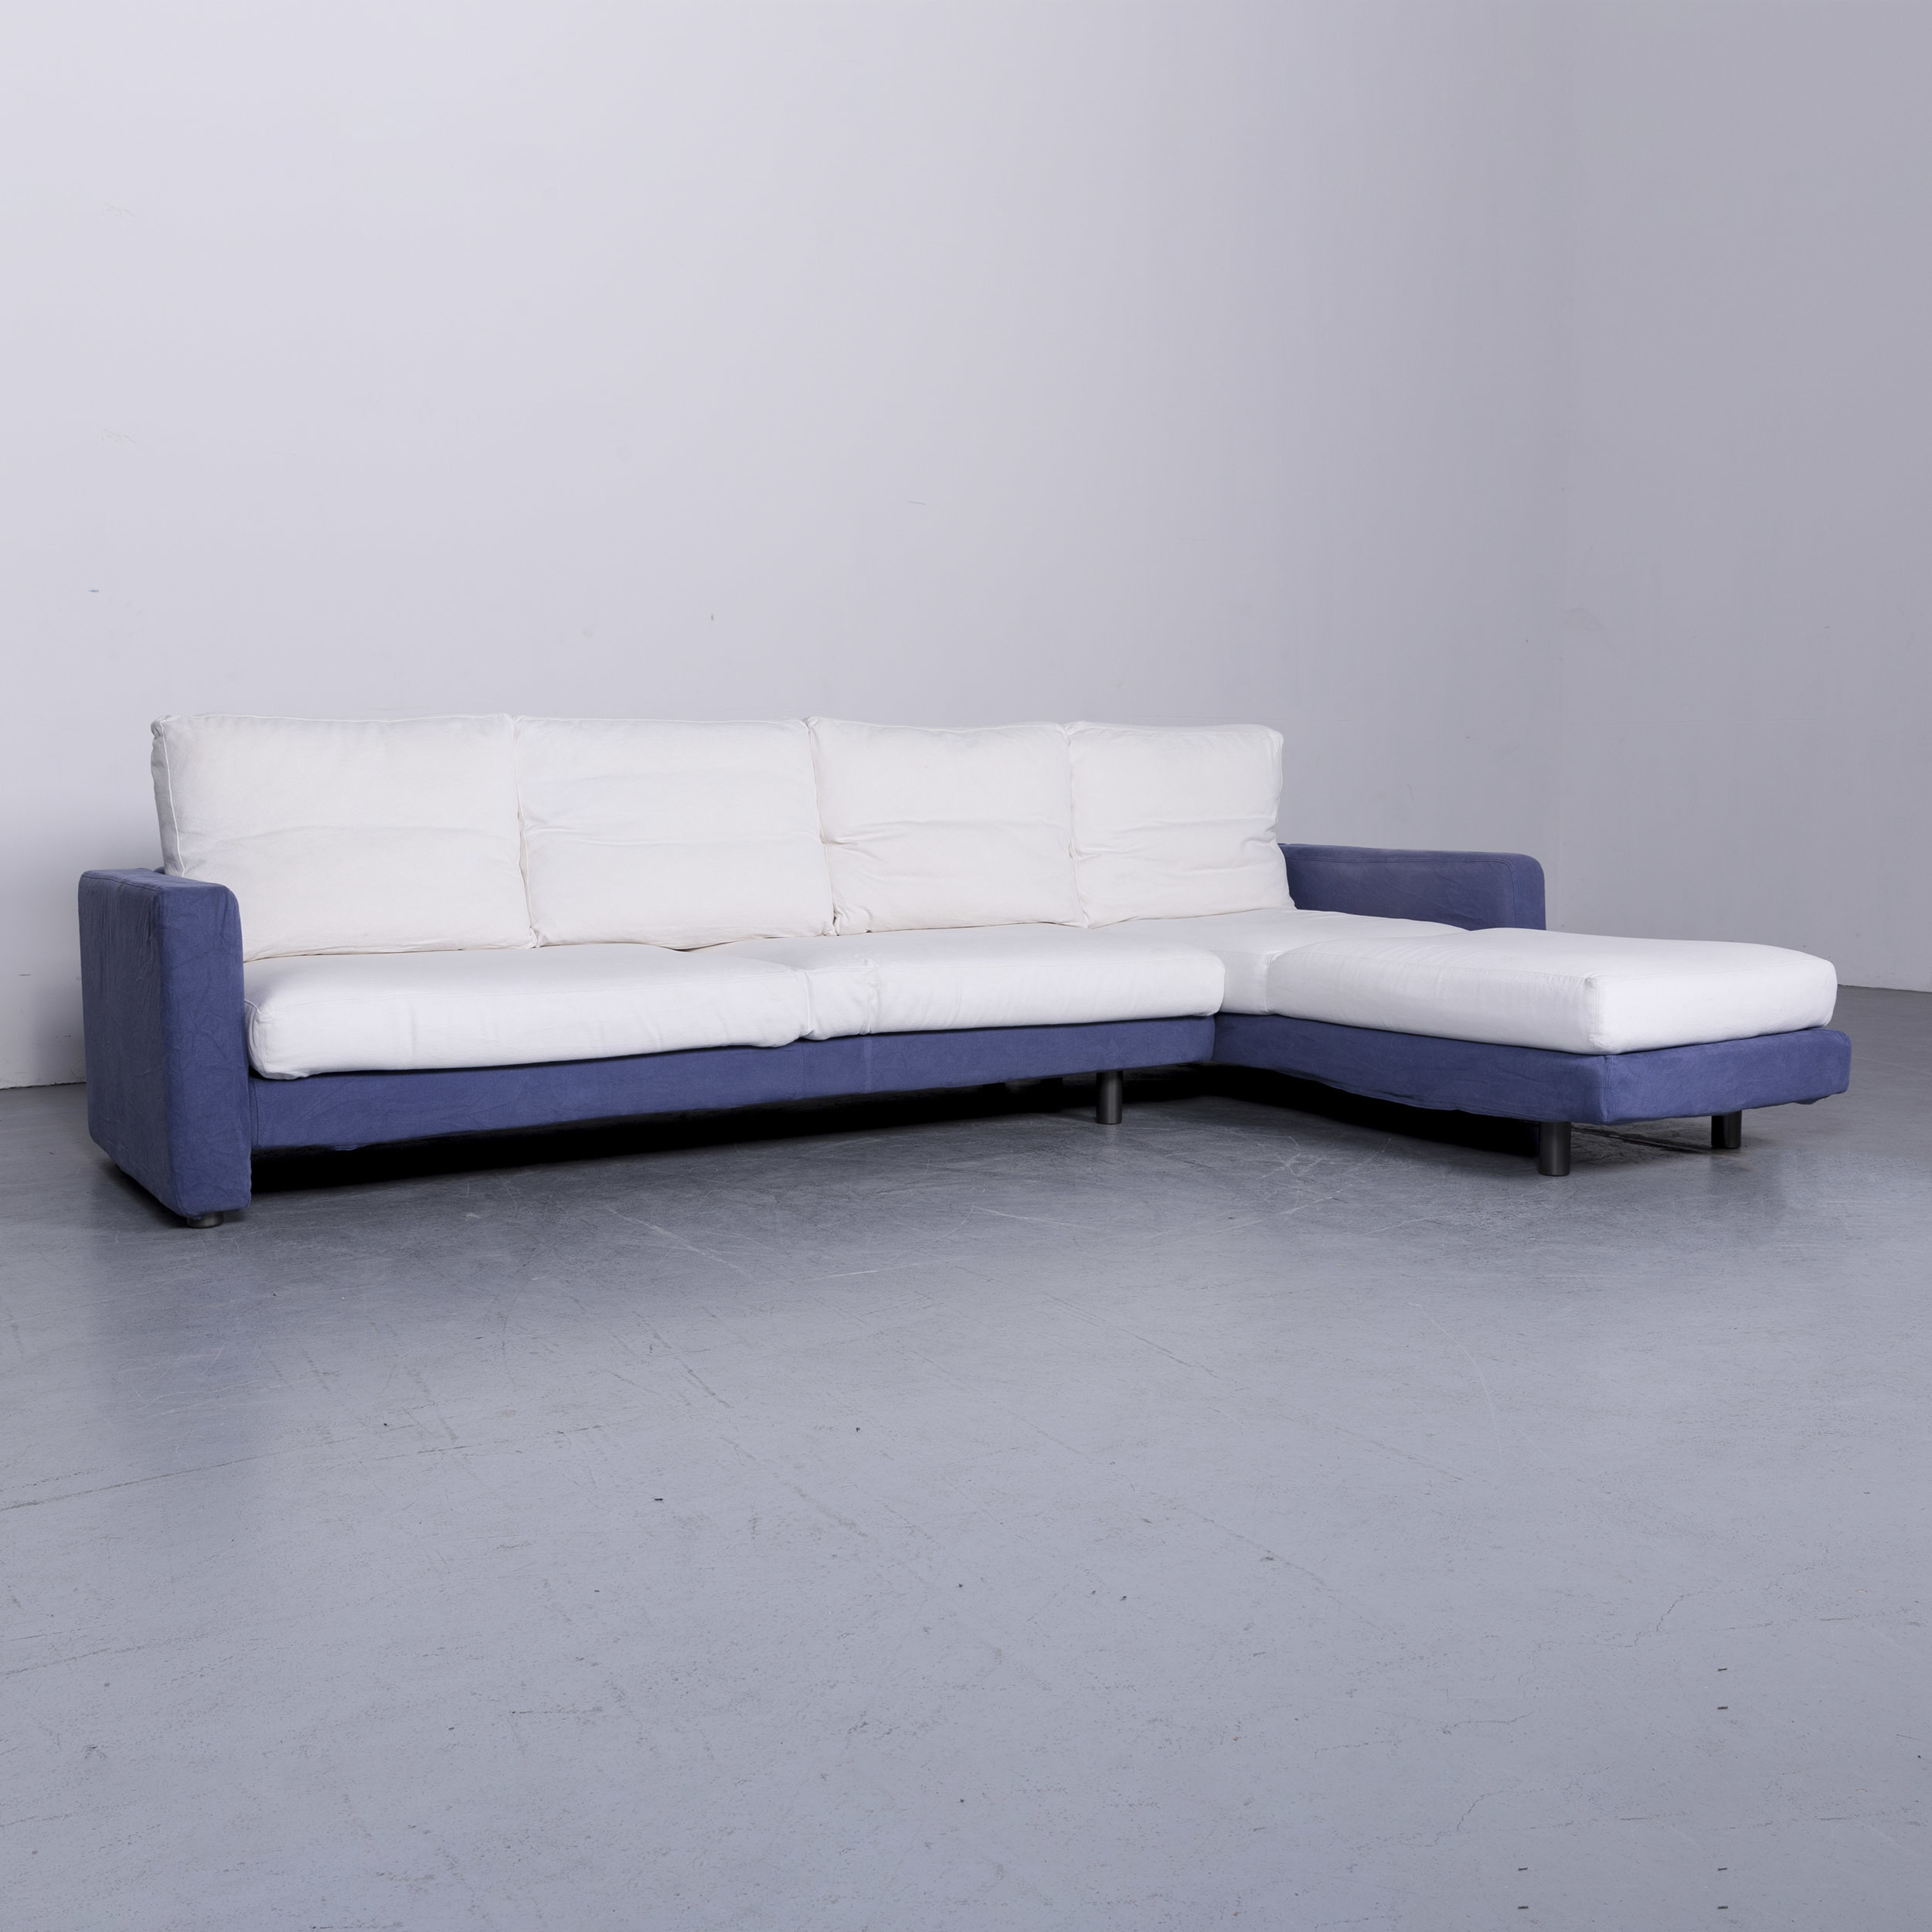 Peachy Dema Designer Fabric Sofa Blue White Corner Sofa Couch 6572 Gamerscity Chair Design For Home Gamerscityorg